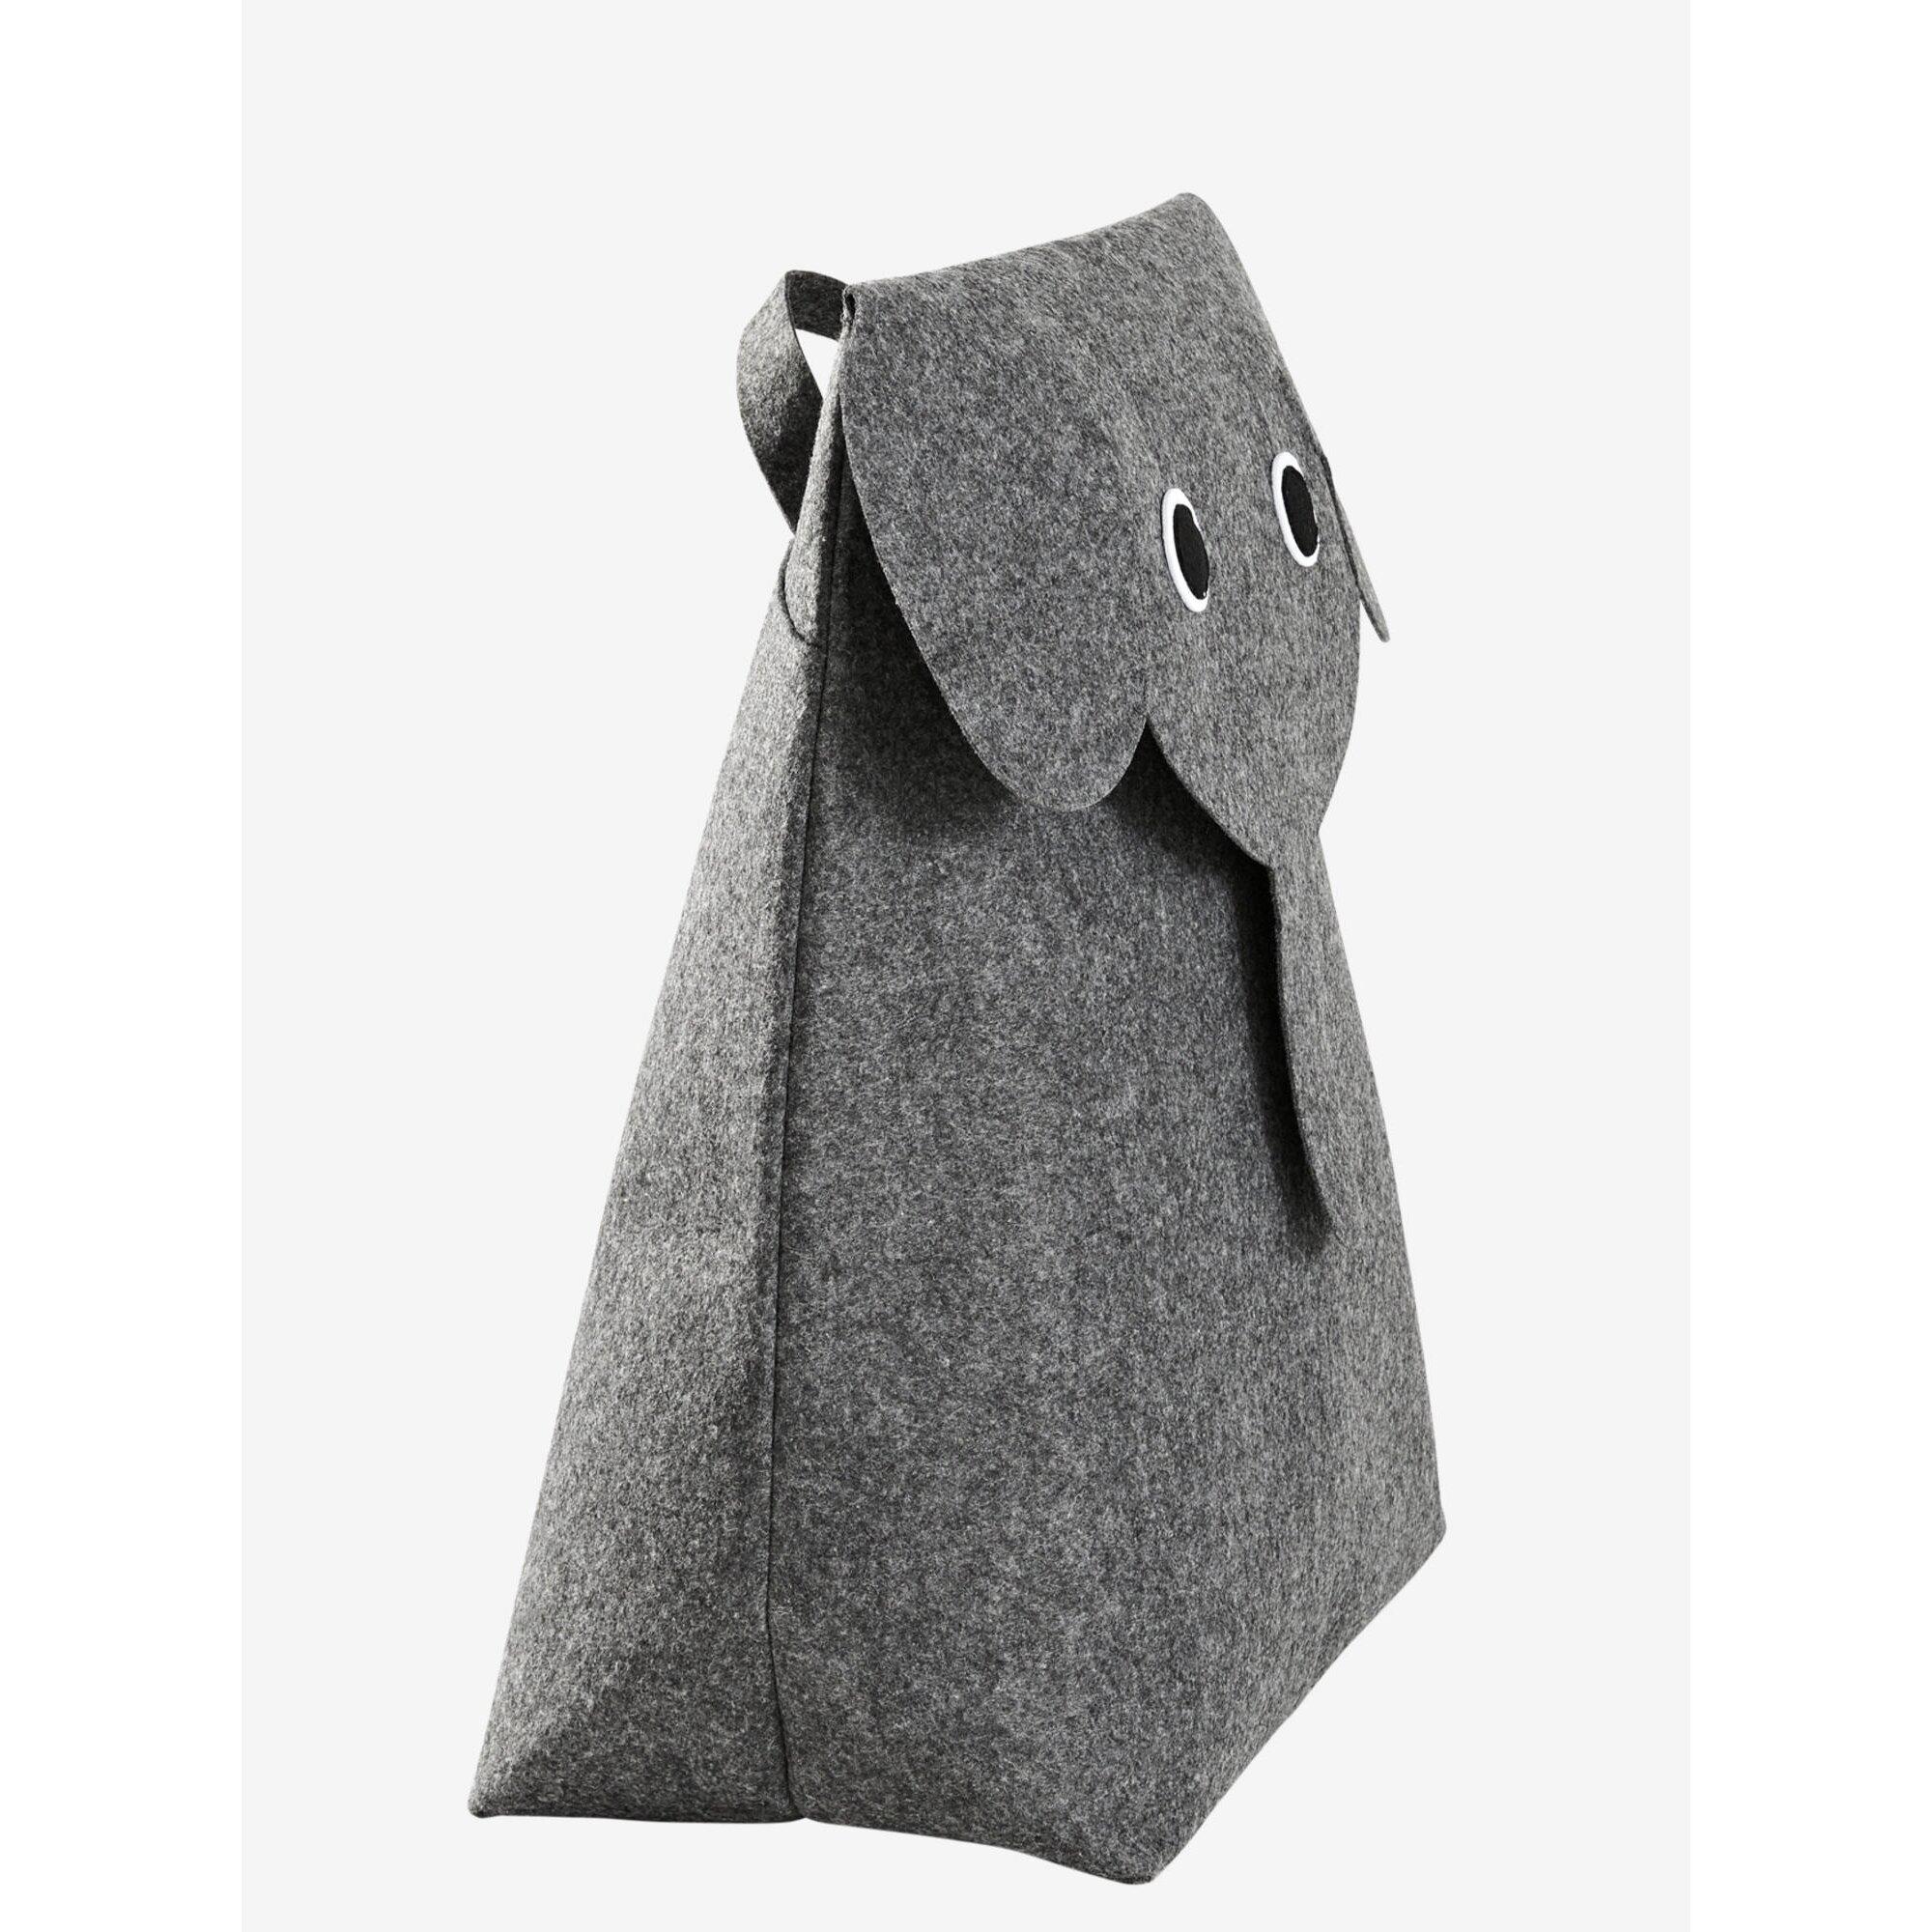 vertbaudet-aufbewahrungsbox-elefant-aus-filz, 25.99 EUR @ babywalz-de